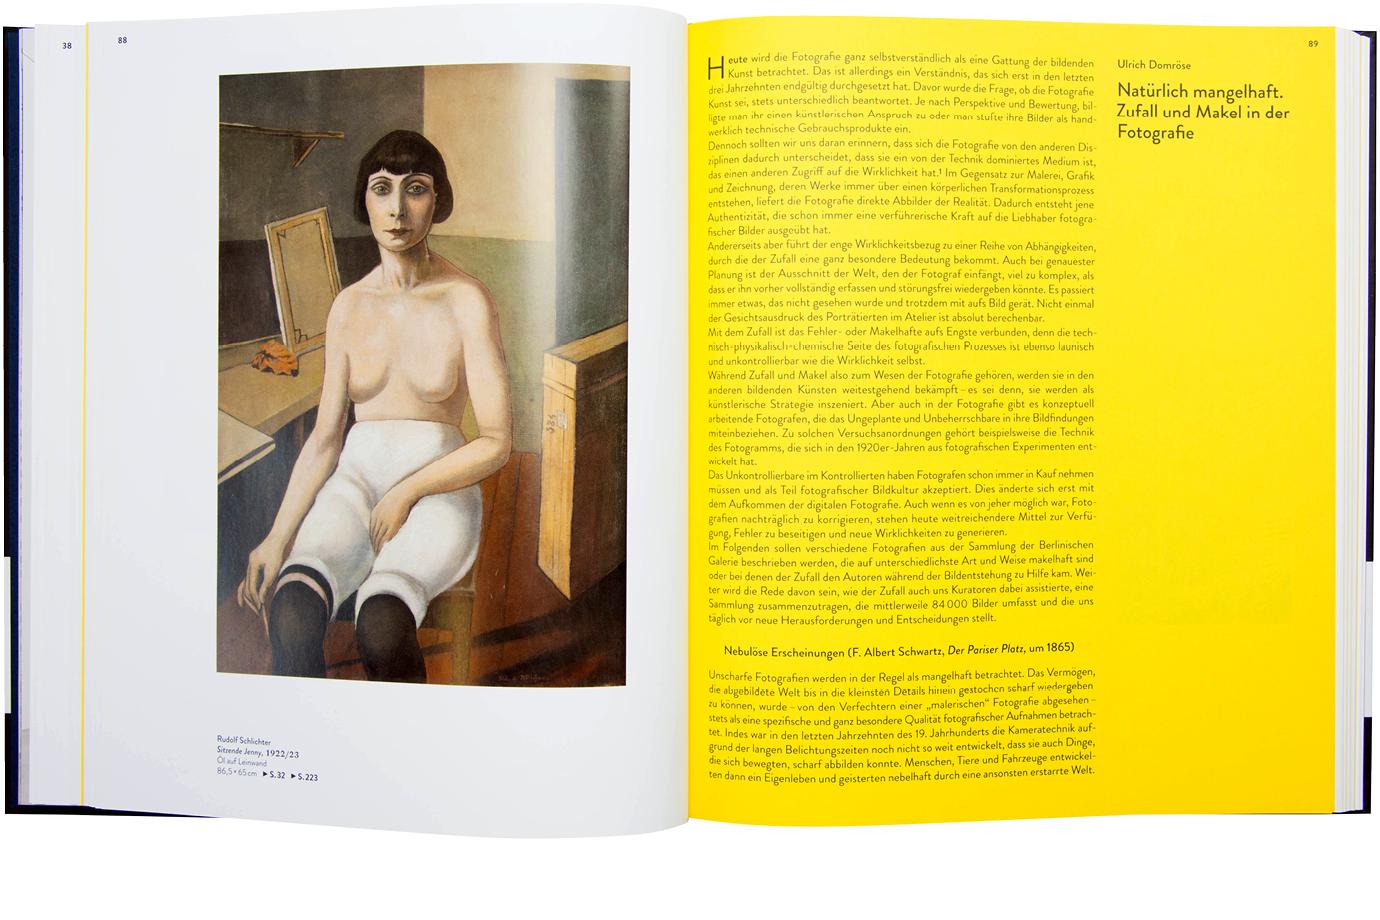 http://e-o-t.de/wordpress/wp-content/uploads/2017/06/2015_eot-BG-Jubilaeum-Book-10.jpg